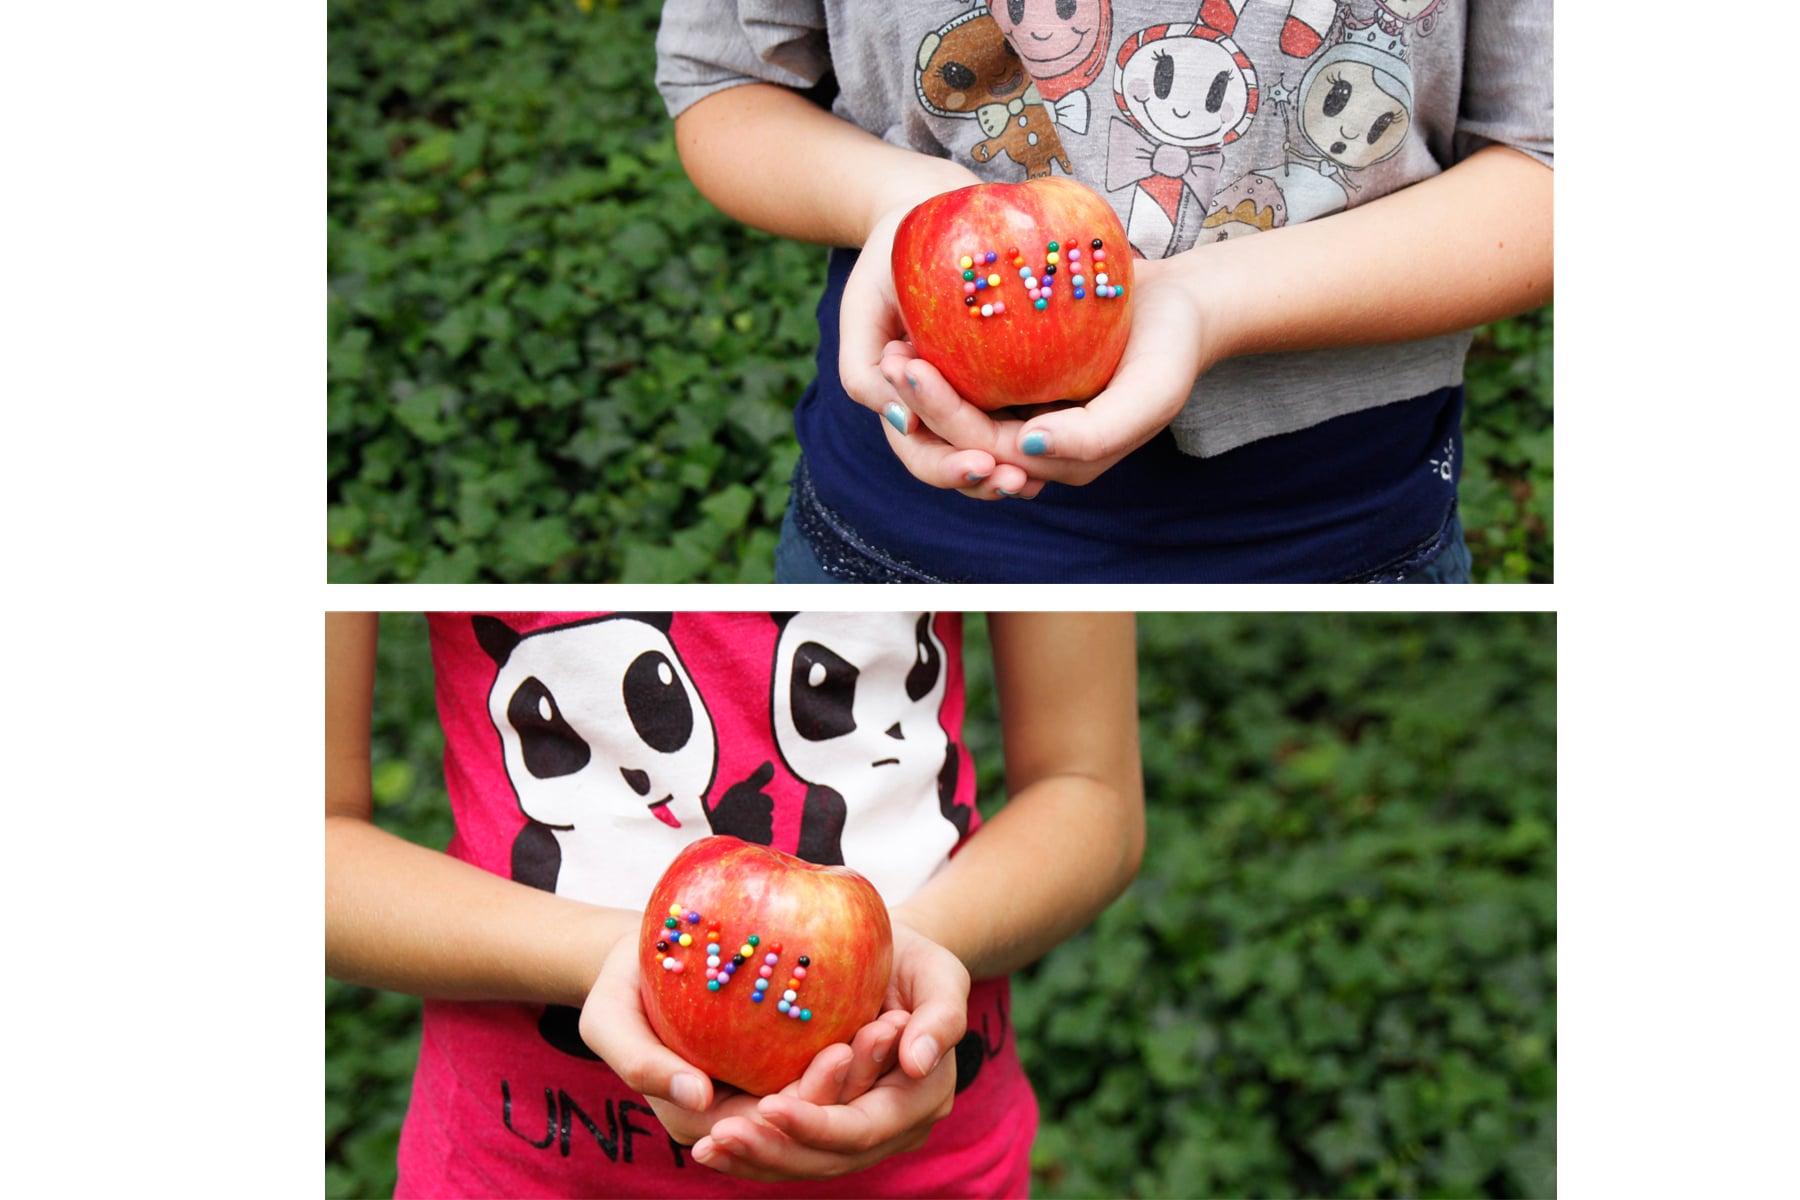 Evil Apple Twin 2( Top) Evil Apple Twin (Bottom)